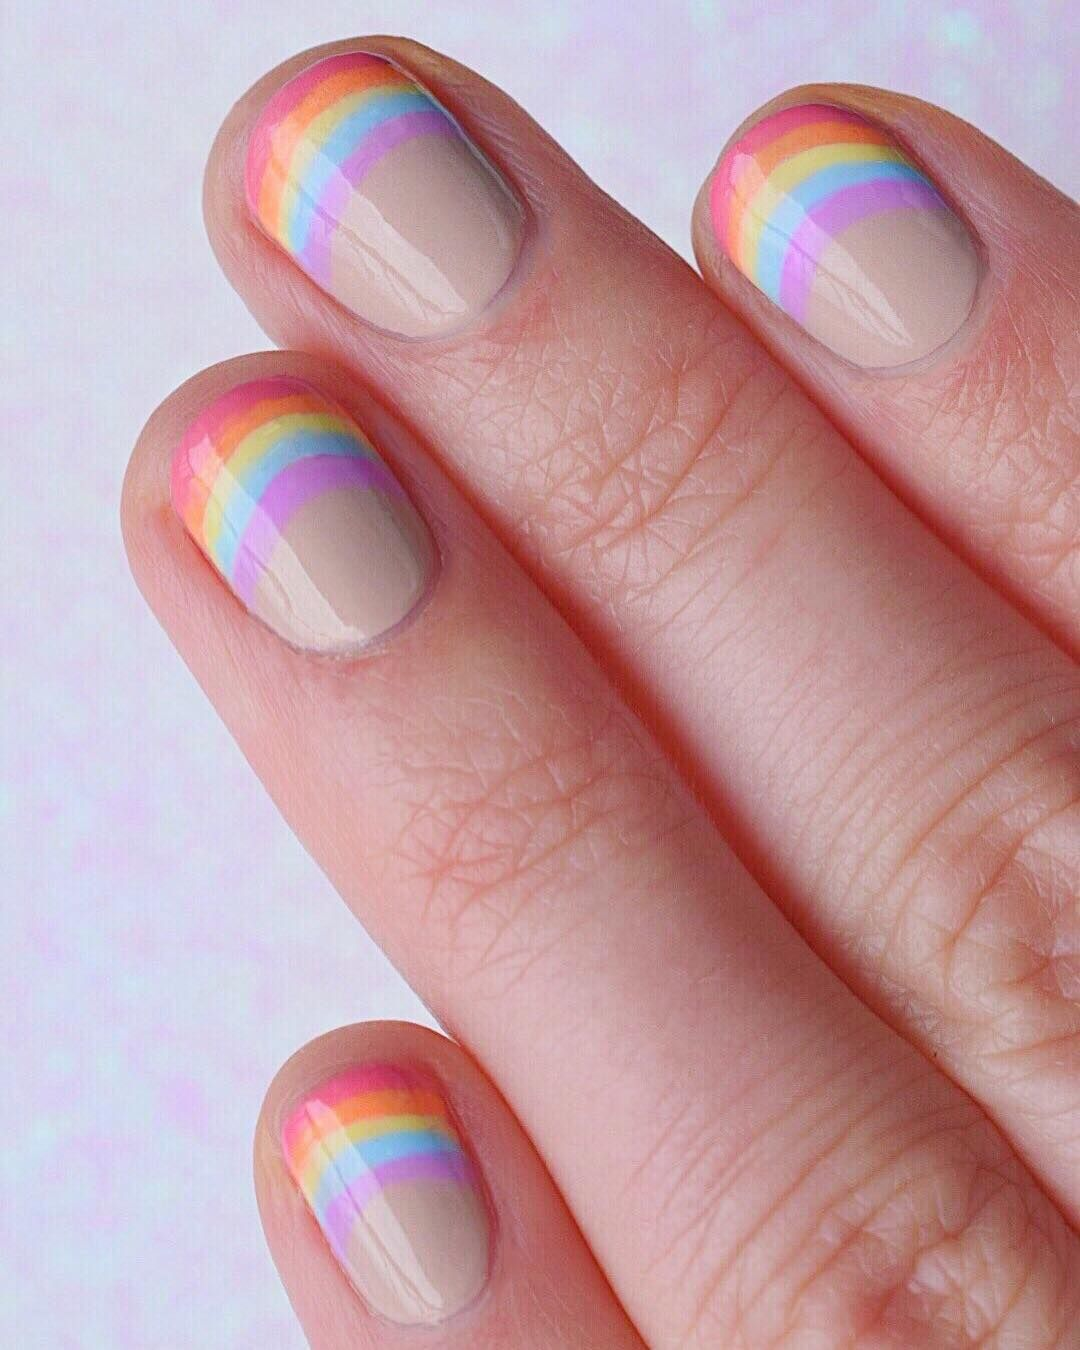 Photo of Rainbow French Manicure Nail Art by @karanailedit